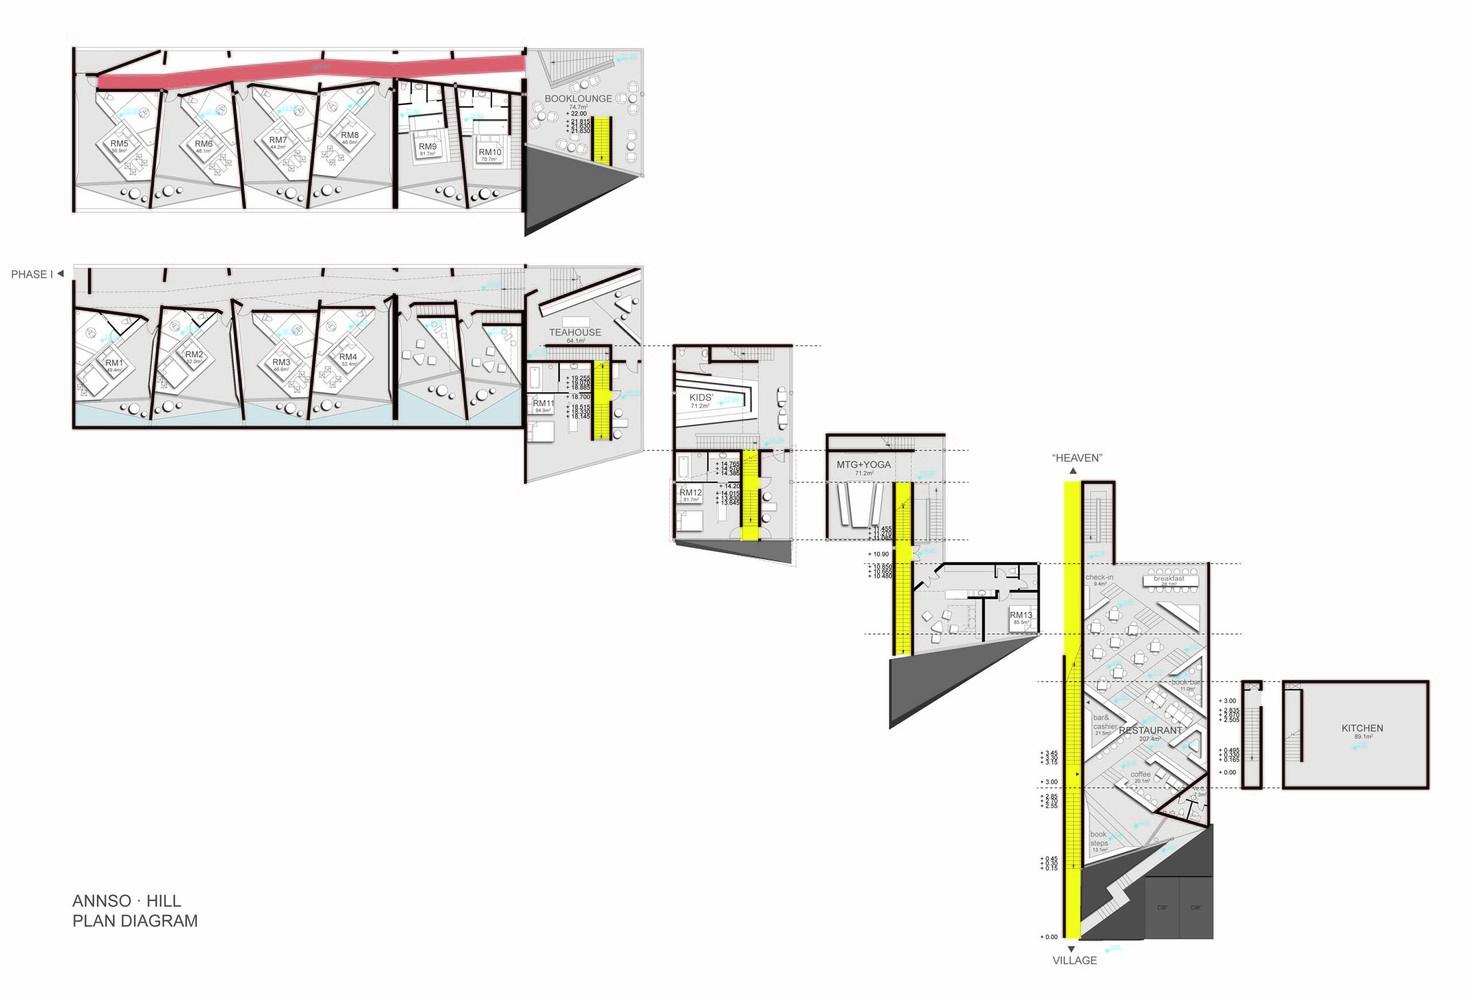 medium resolution of annso hill hotel studio qi plan